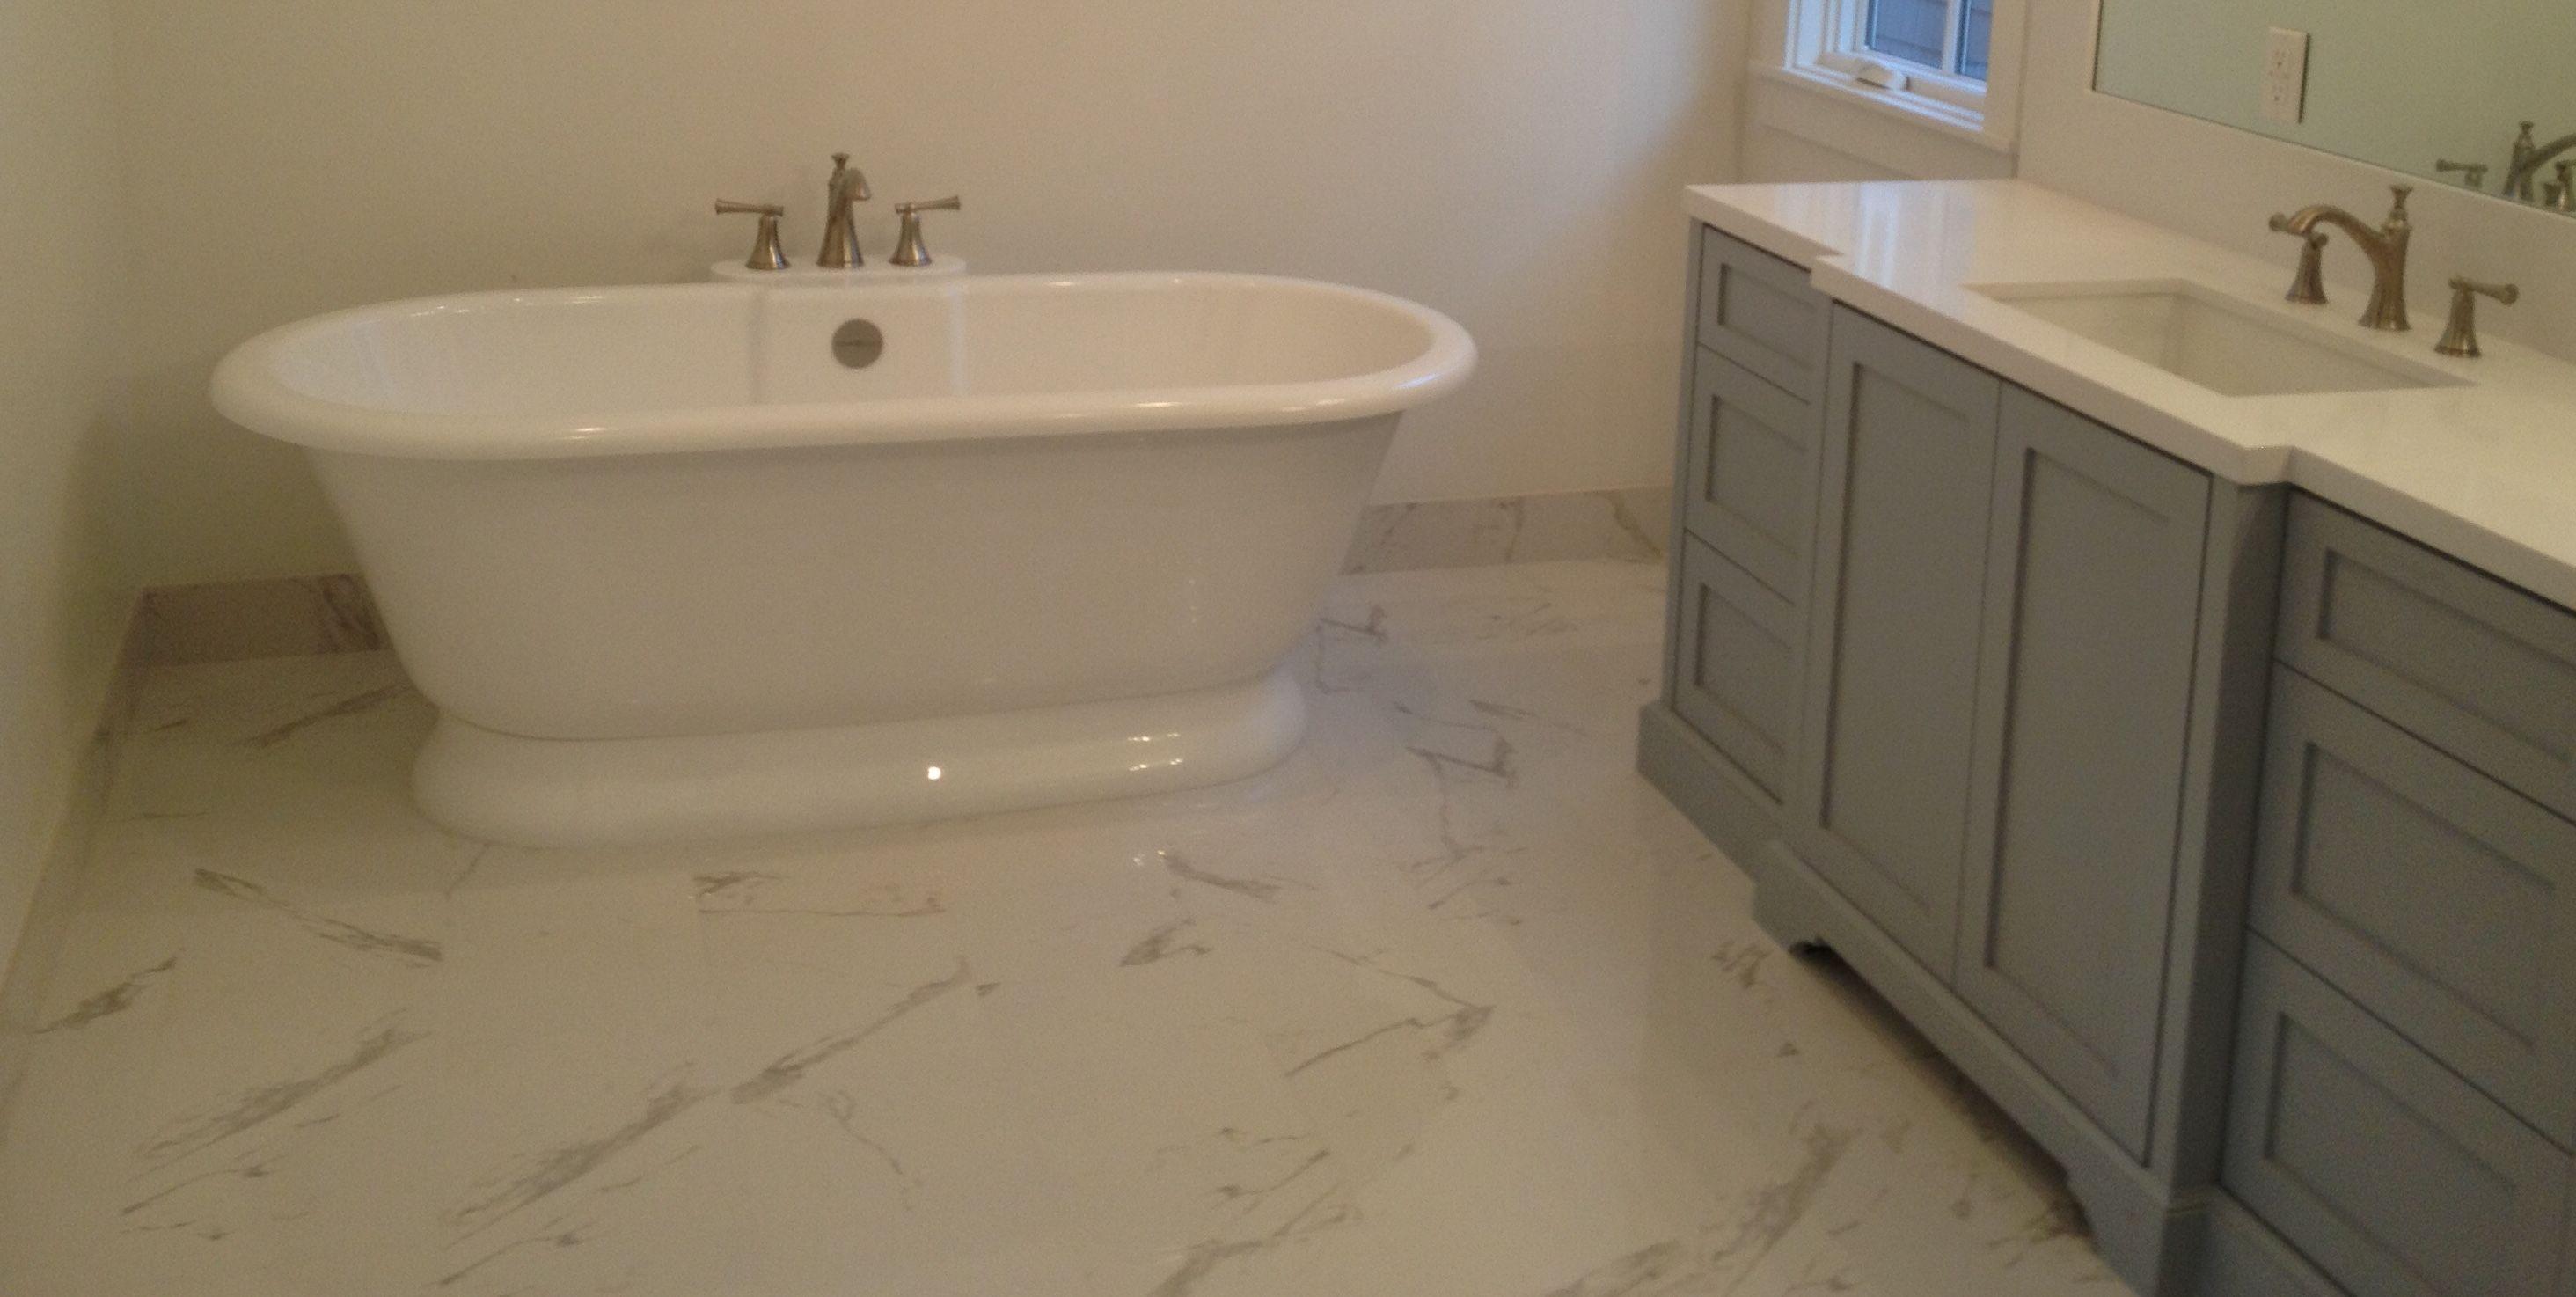 12x24 Carrara Porcelain Polished Bathroom Traditional Contemporary Marble Porcelain Ctm Tile 310 379 7646 Bathroom Sets Polished Bathroom Fitted Bathroom